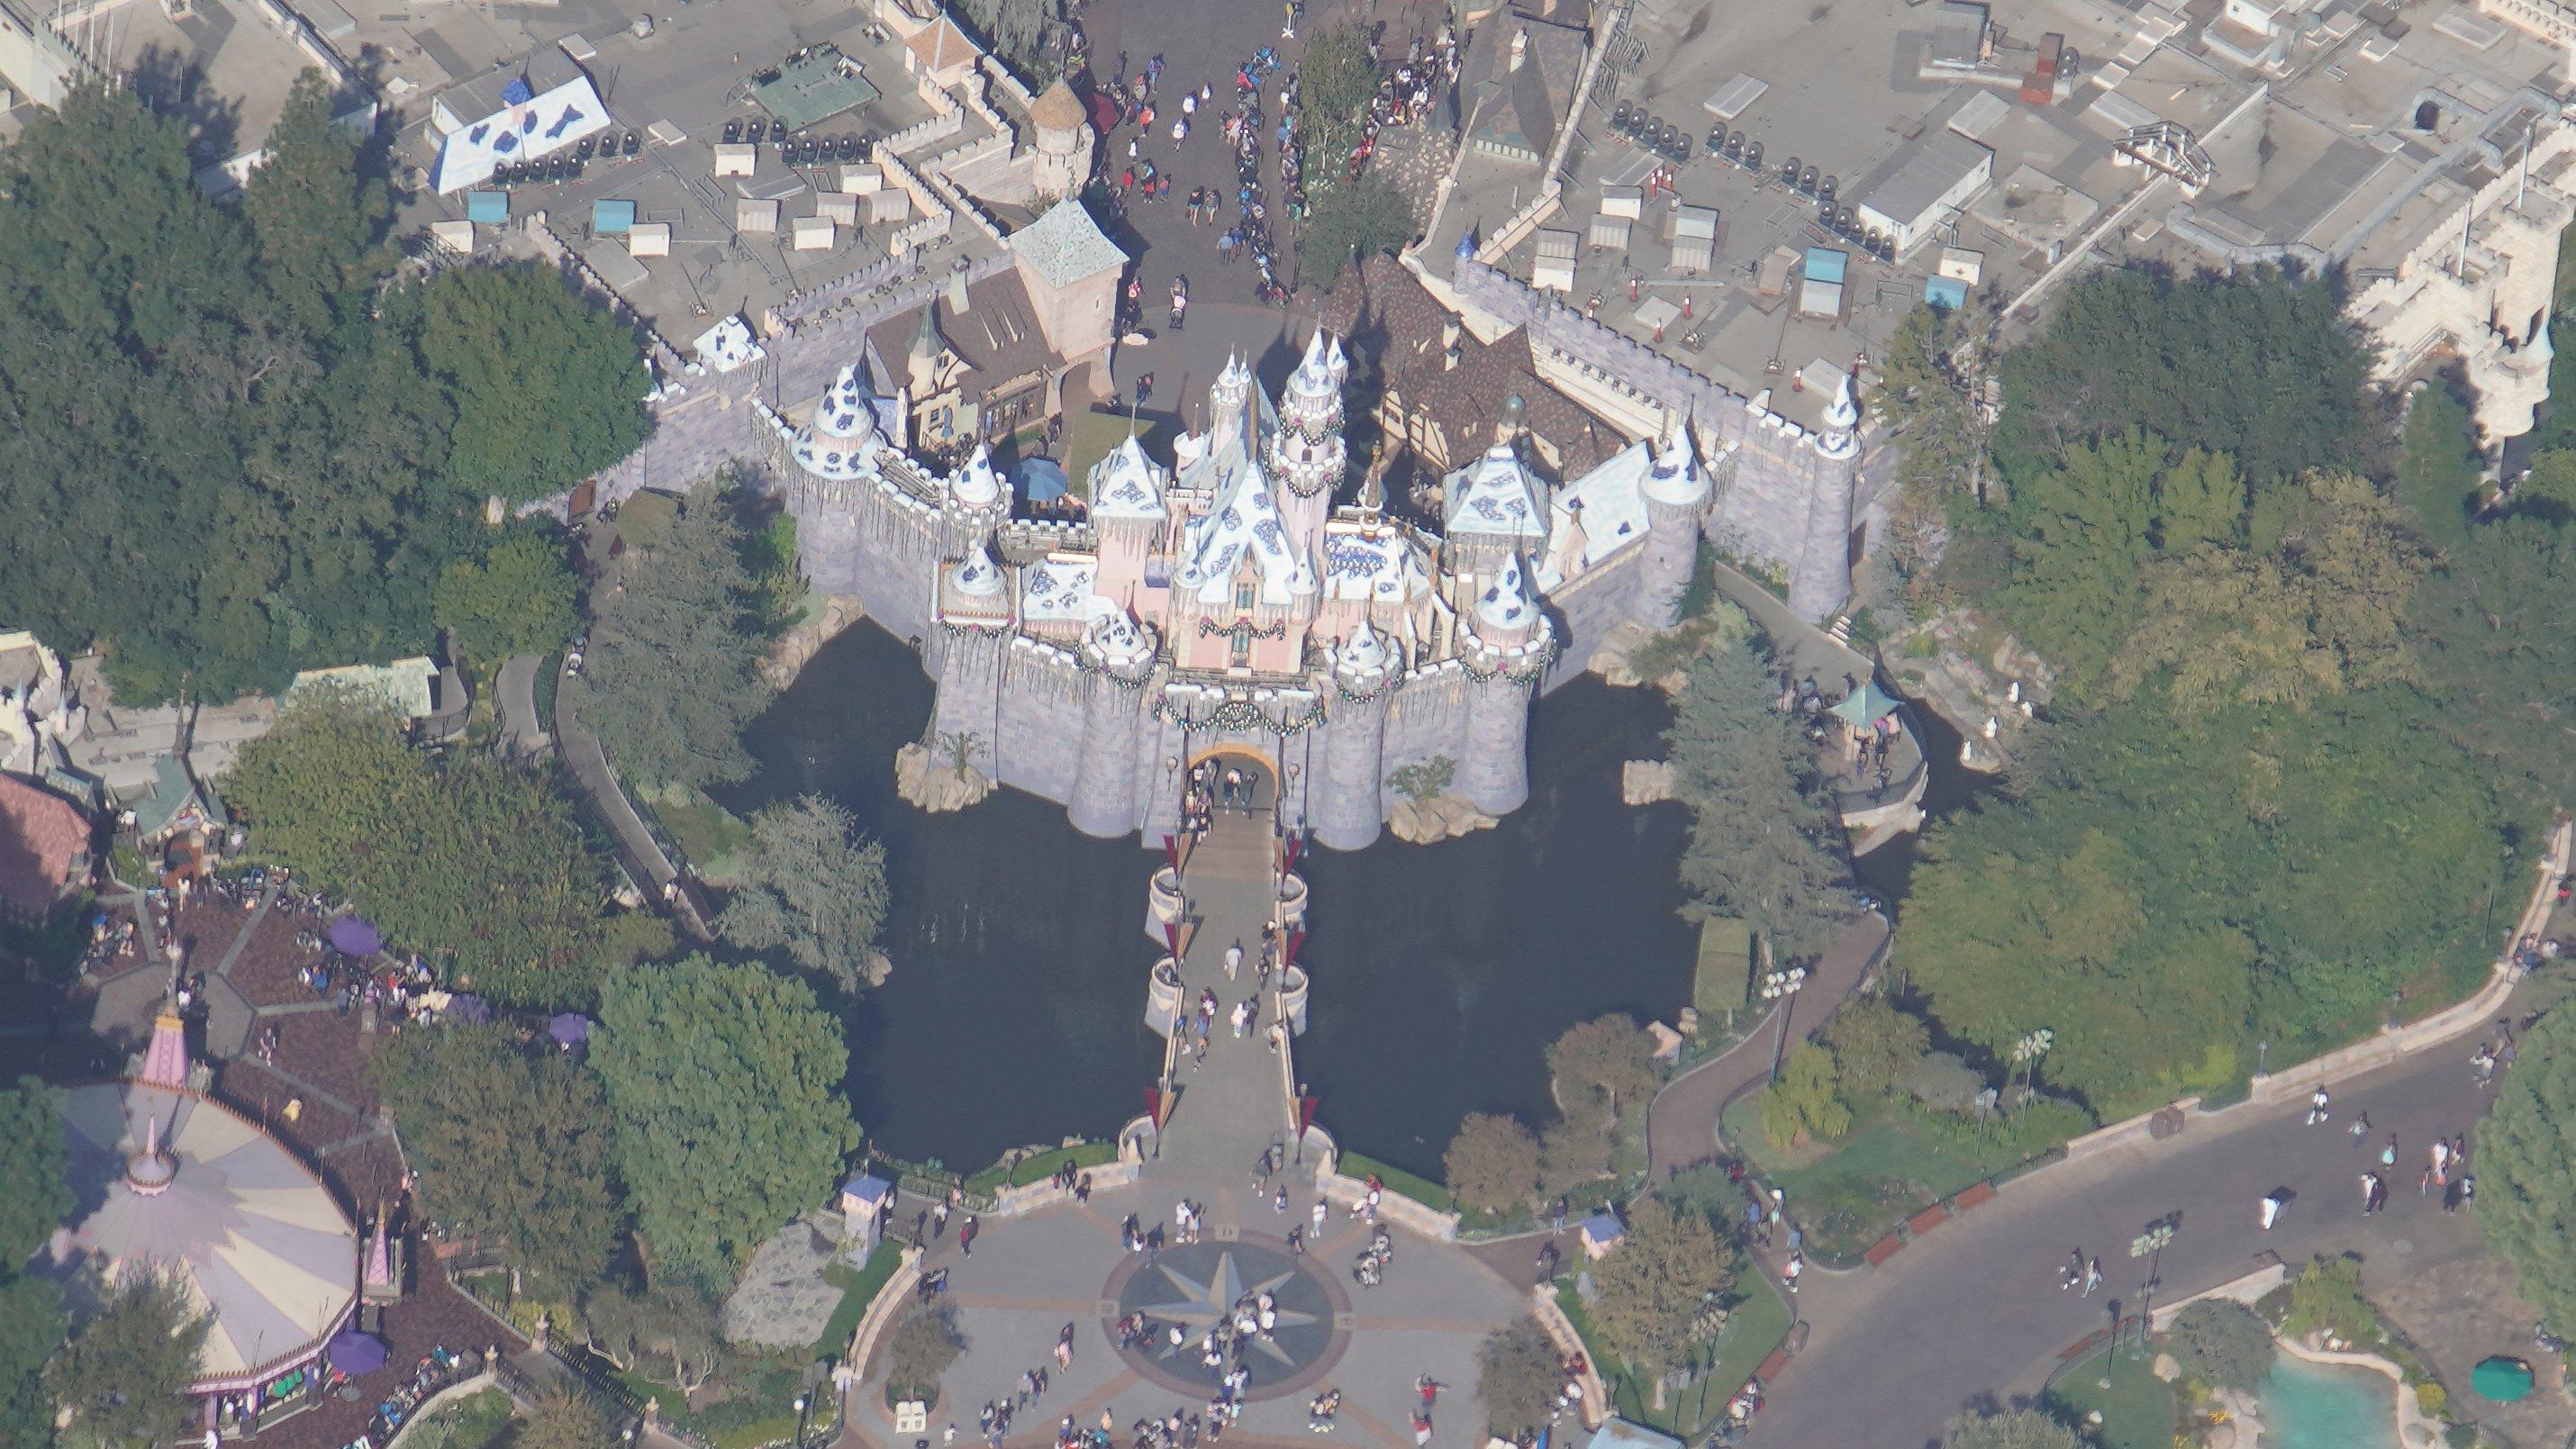 Disneyland Resort vu du ciel, des images sublimes! EJYzGlbVUAArA4A?format=jpg&name=4096x4096